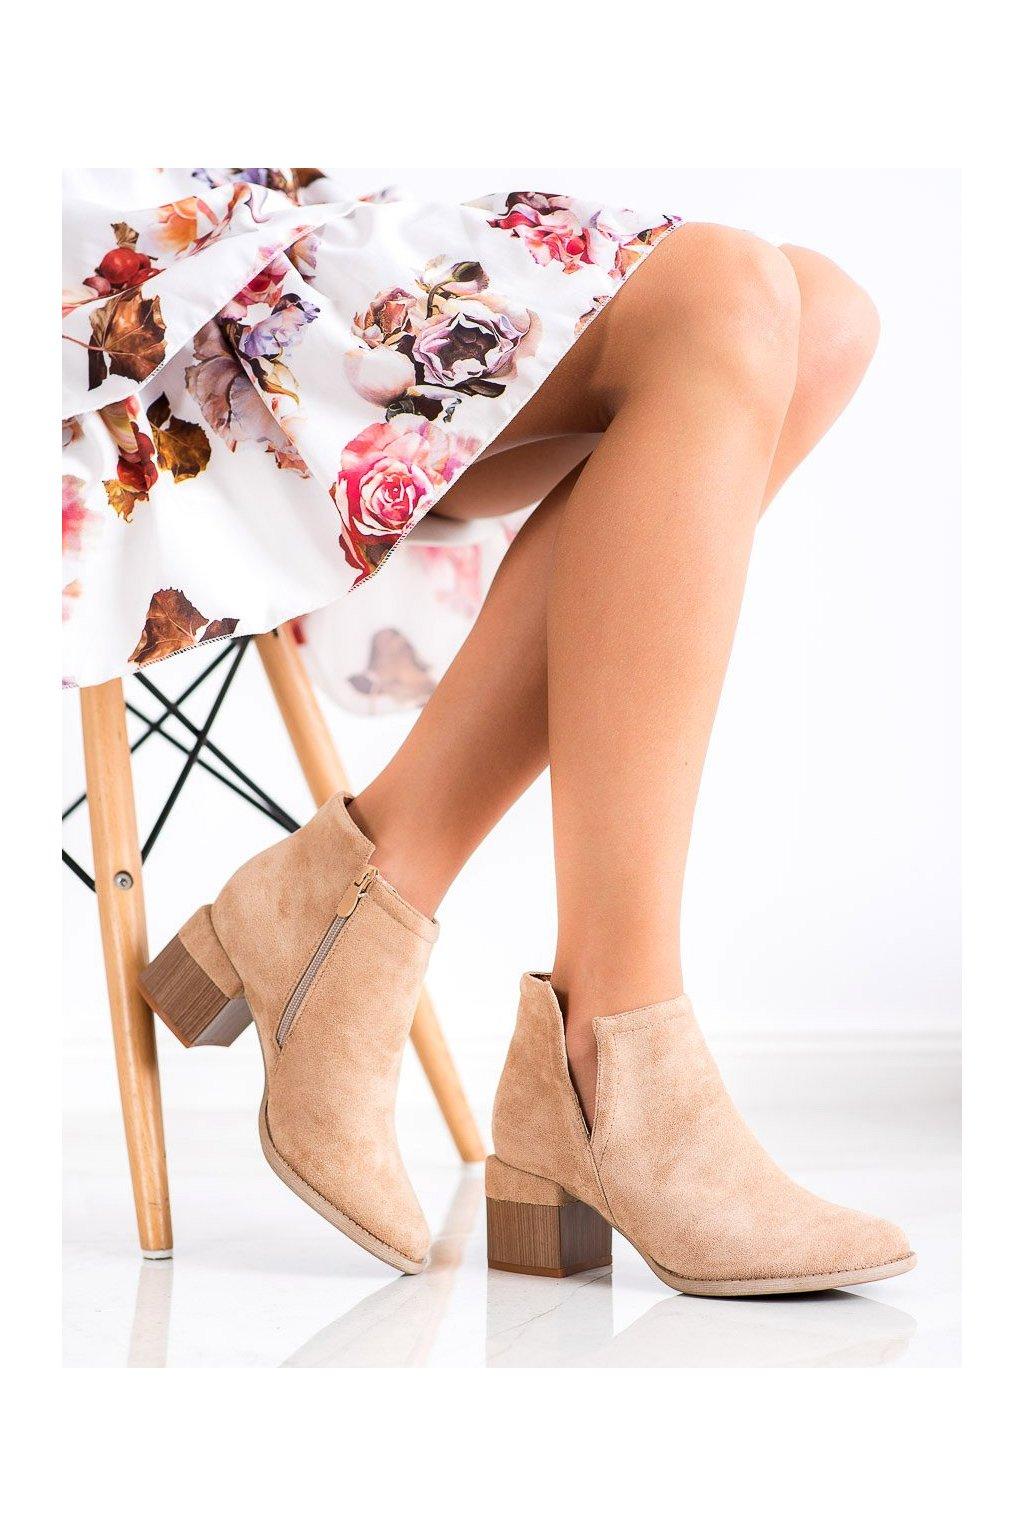 Hnedé dámske topánky Bella paris kod A6103KH